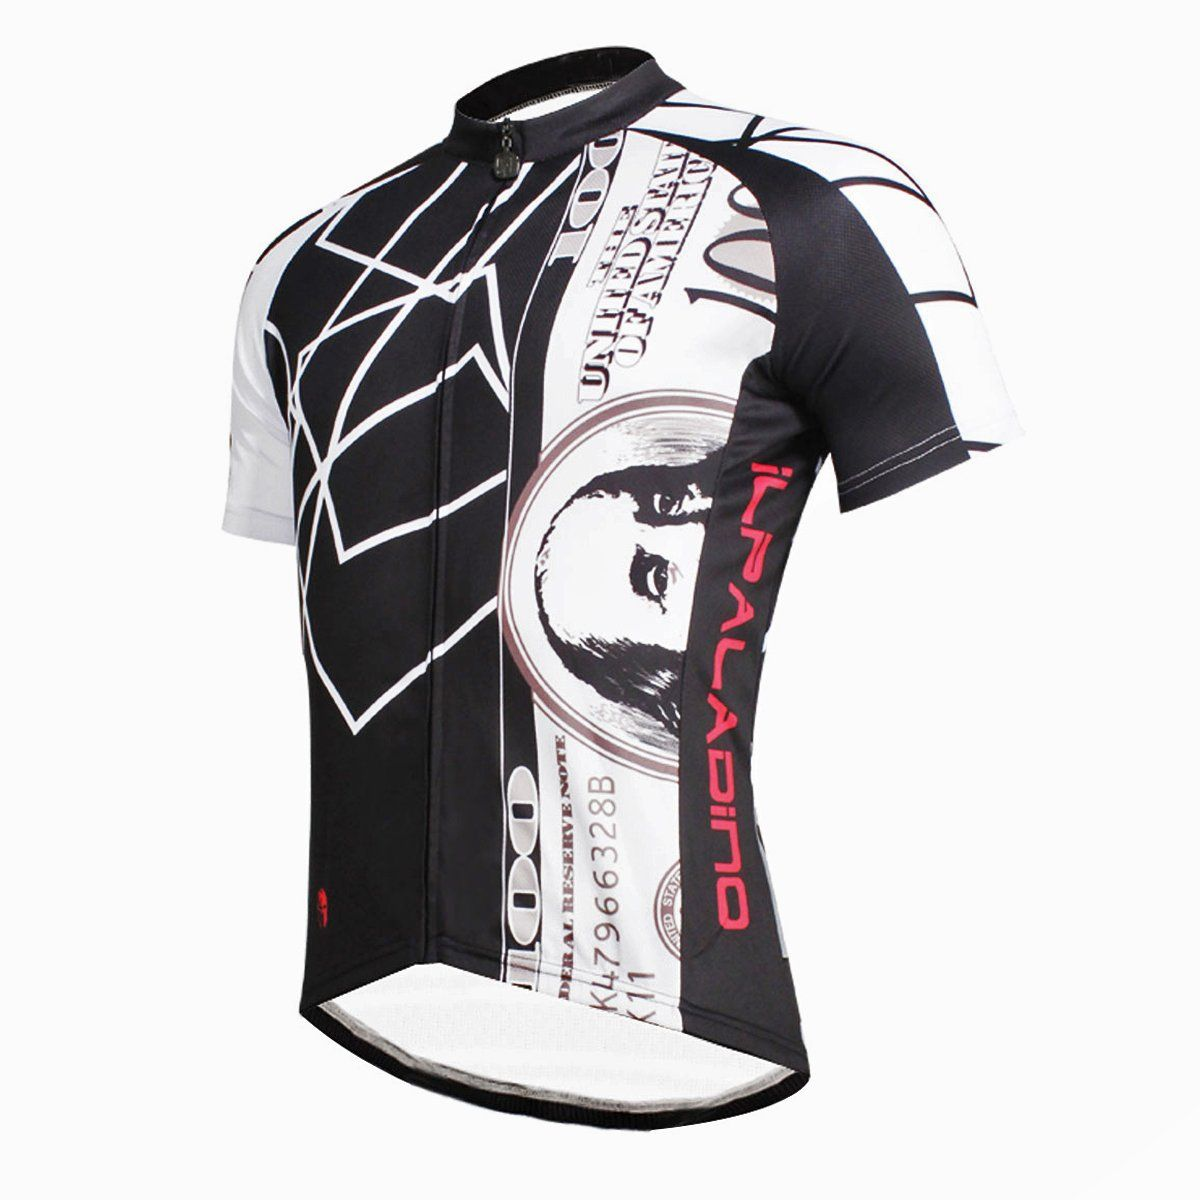 ILPALADINO Dollars Professional MTB Cycling Jersey Short Sleeve Mountain  Bike Summer Exercise Bicycling Pro Cycle Clothing 6f5437c10